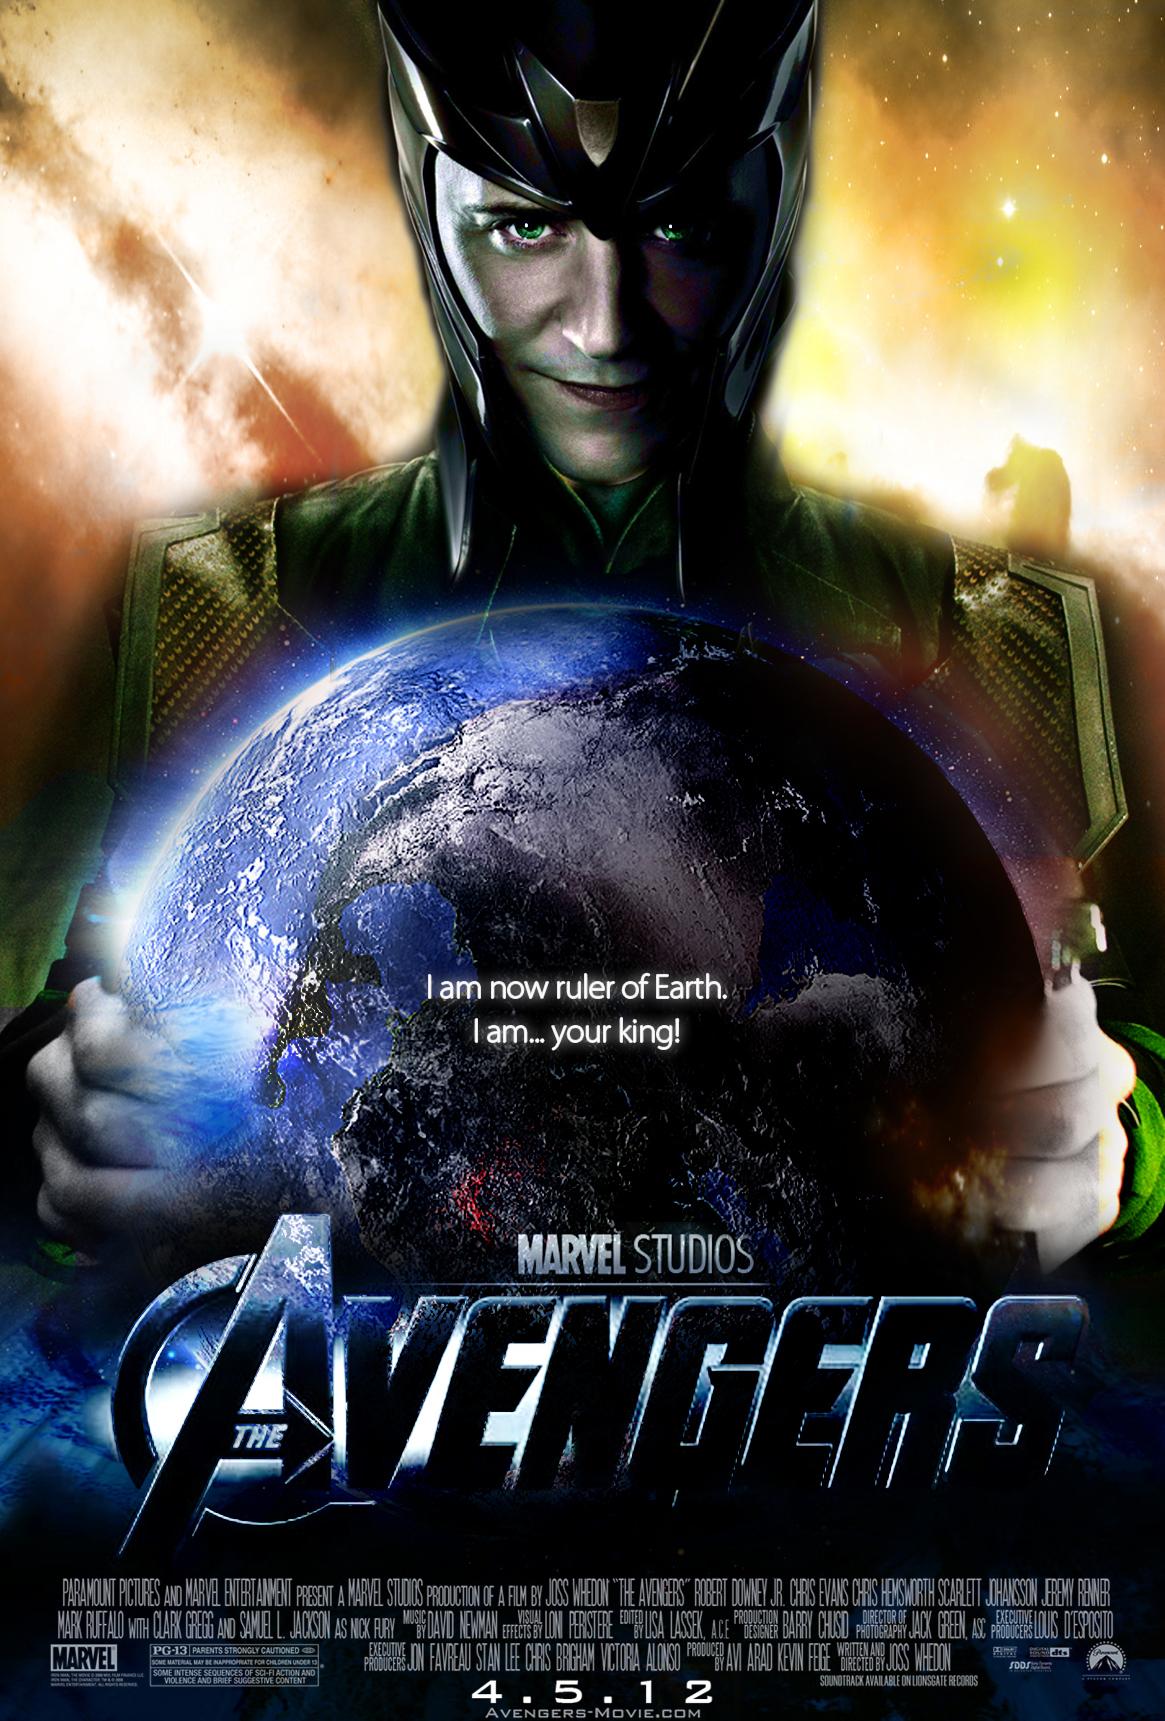 The Avengers Movie Poster Loki by Alex4everdn on DeviantArt